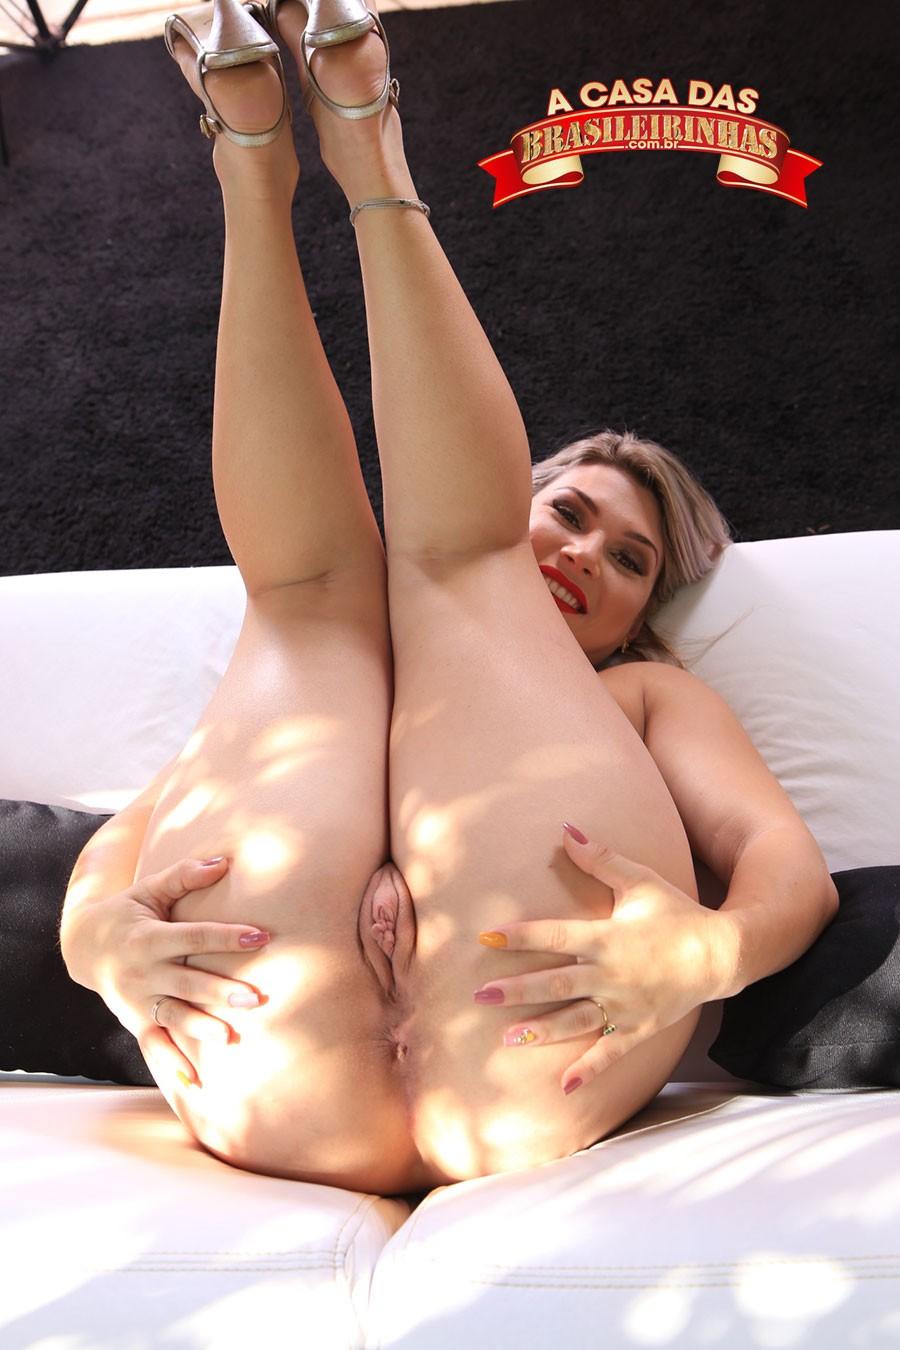 Melody-Antunes-mostrando-a-bucetinha-depilada.jpg